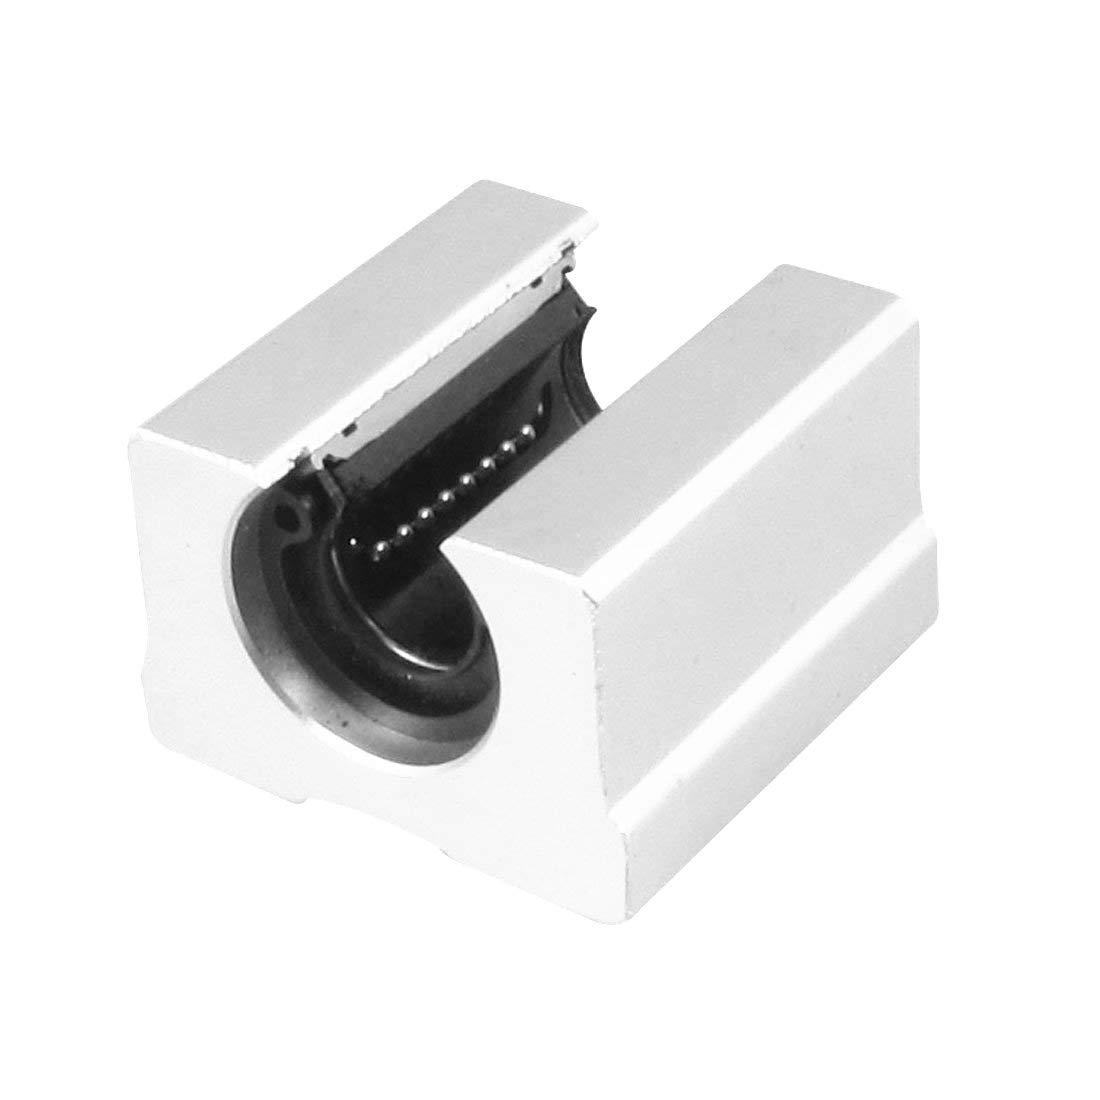 XMHF 16mm Open Linear Bearing SBR16UU Slide Units Bearing Motion Ball Bearing Pillow Block